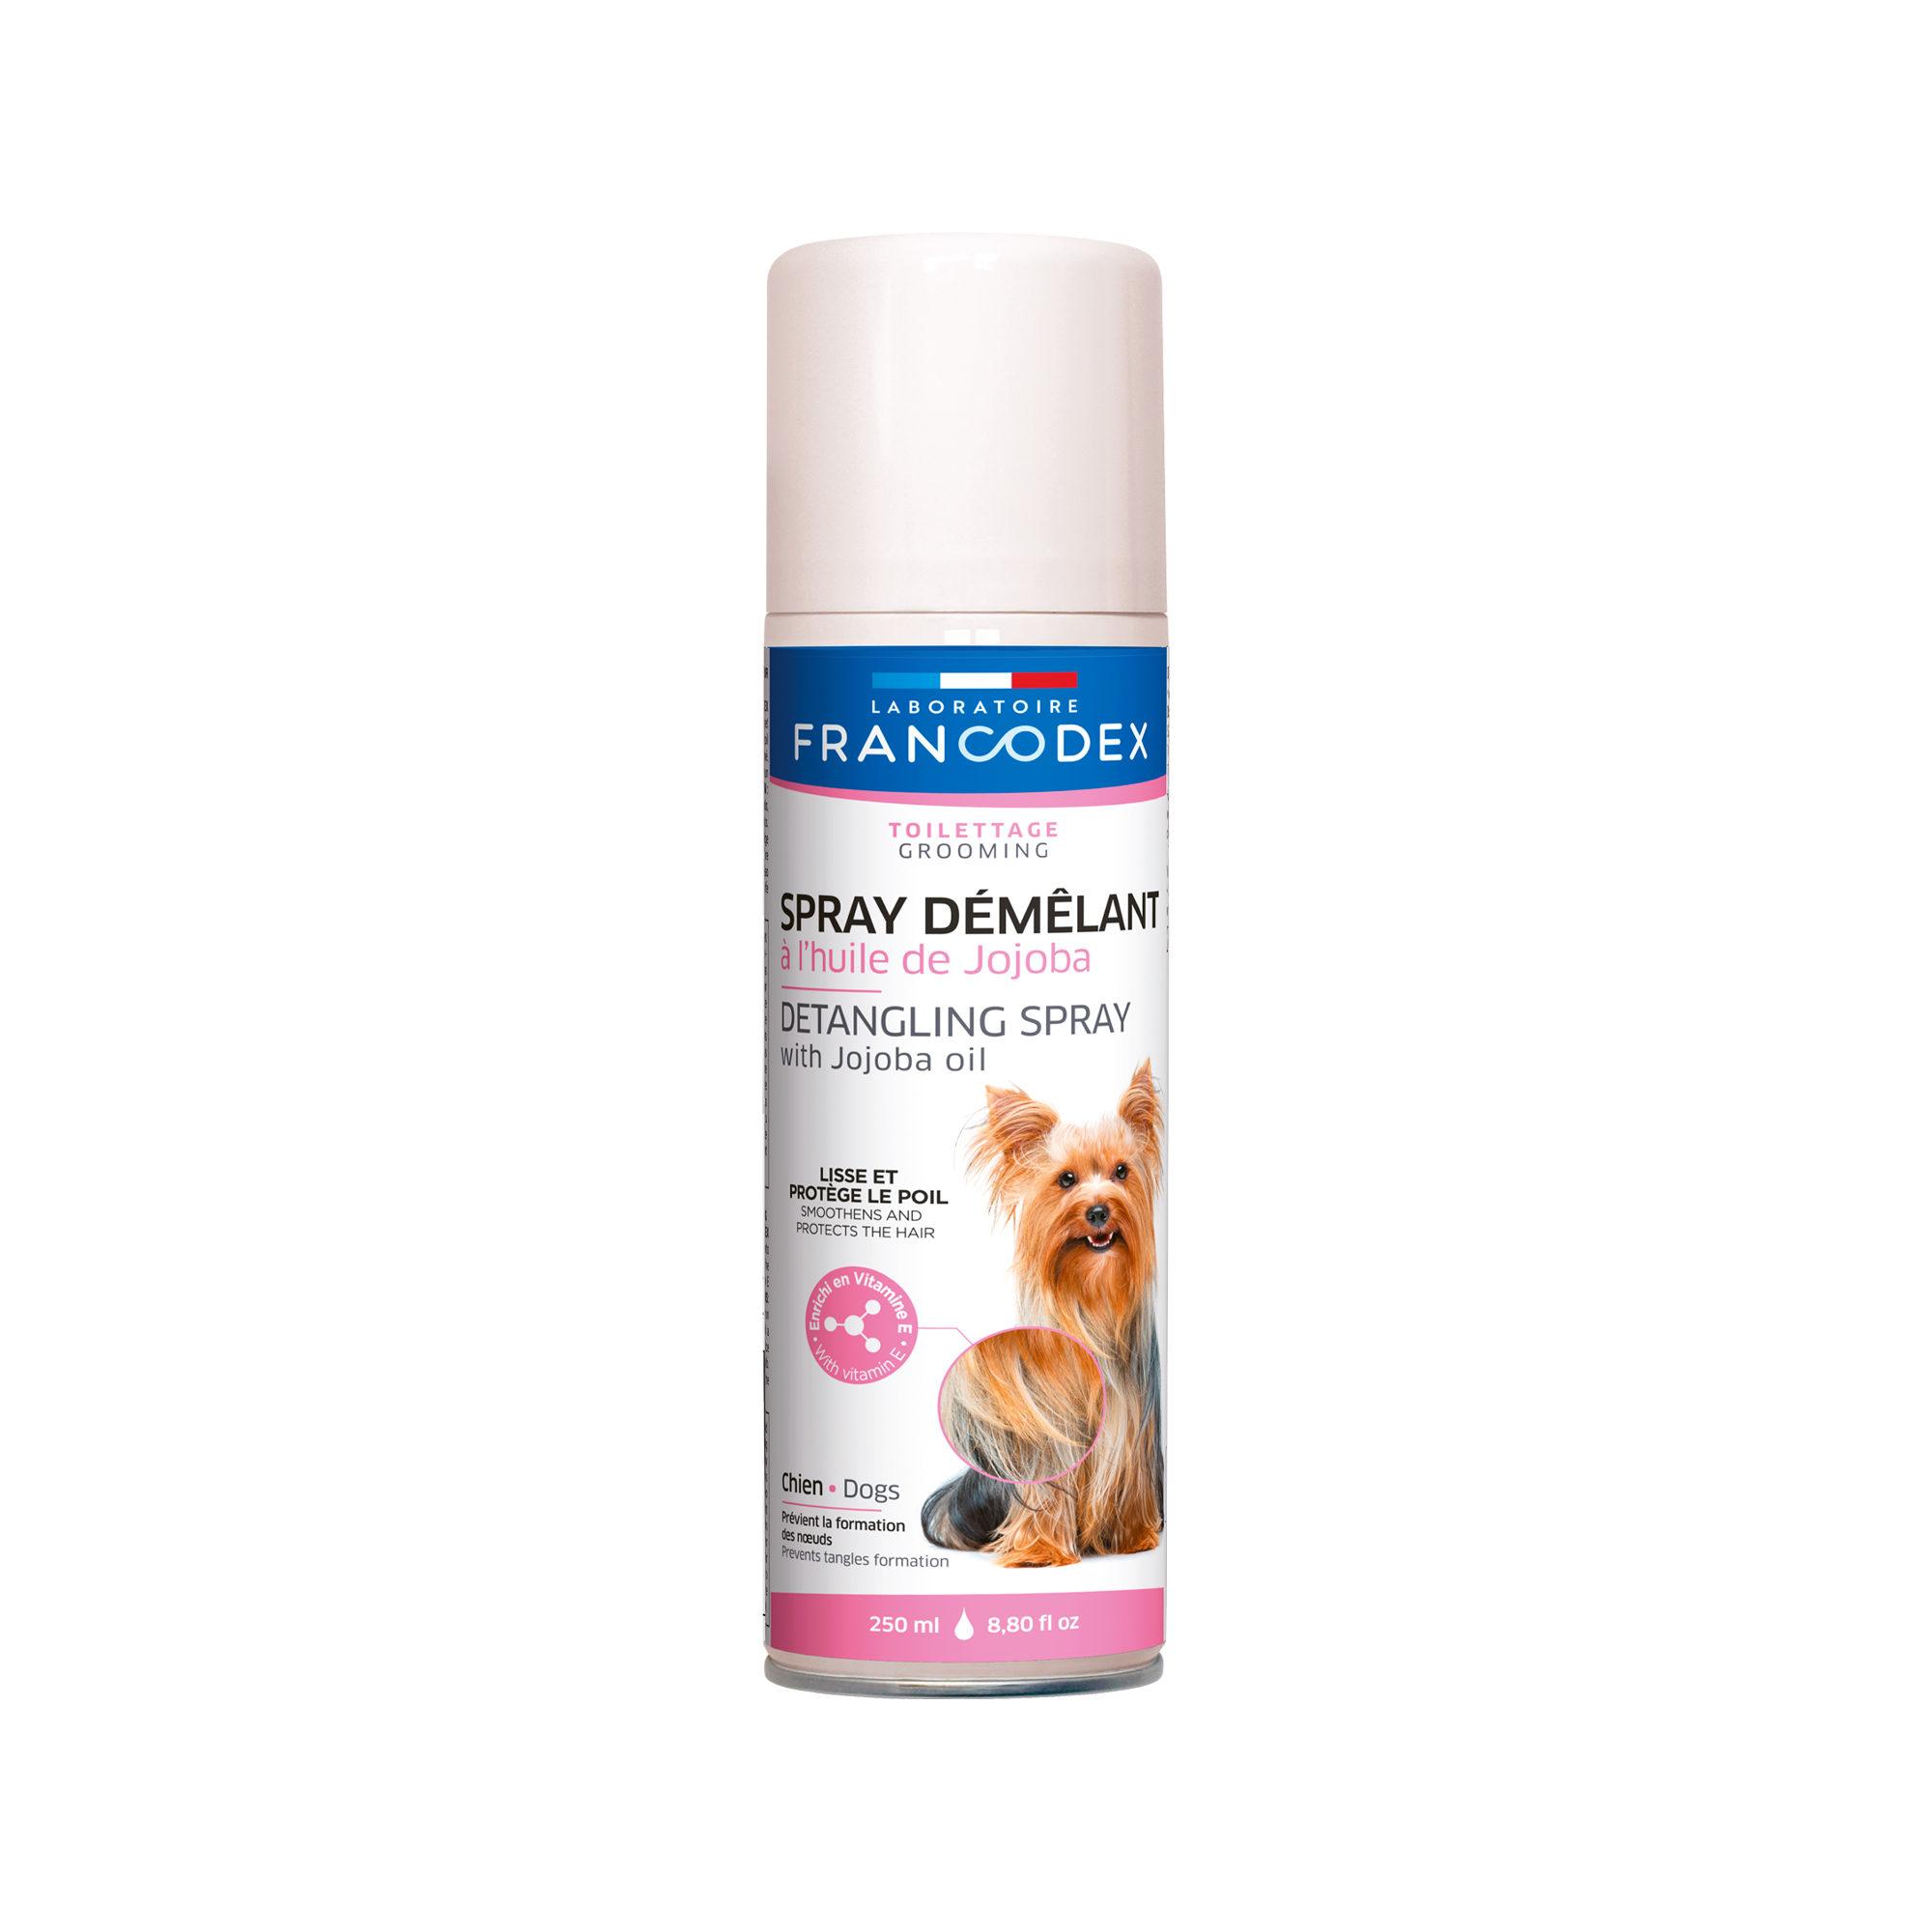 Francodex Detangling Spray